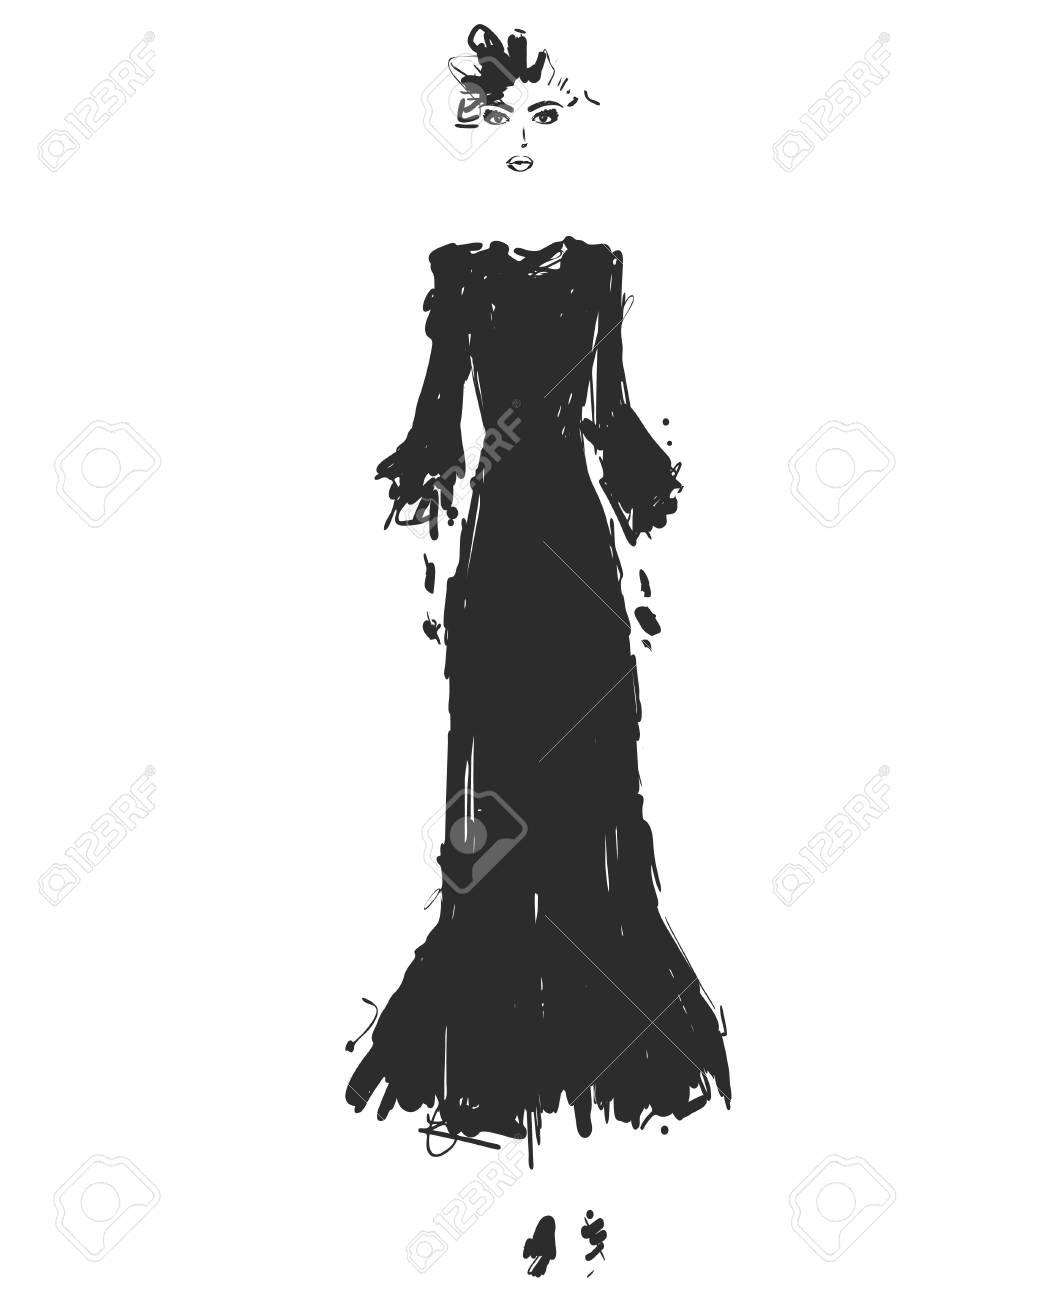 Beautiful Young Girl For Design In A Black Long Dress Fashion